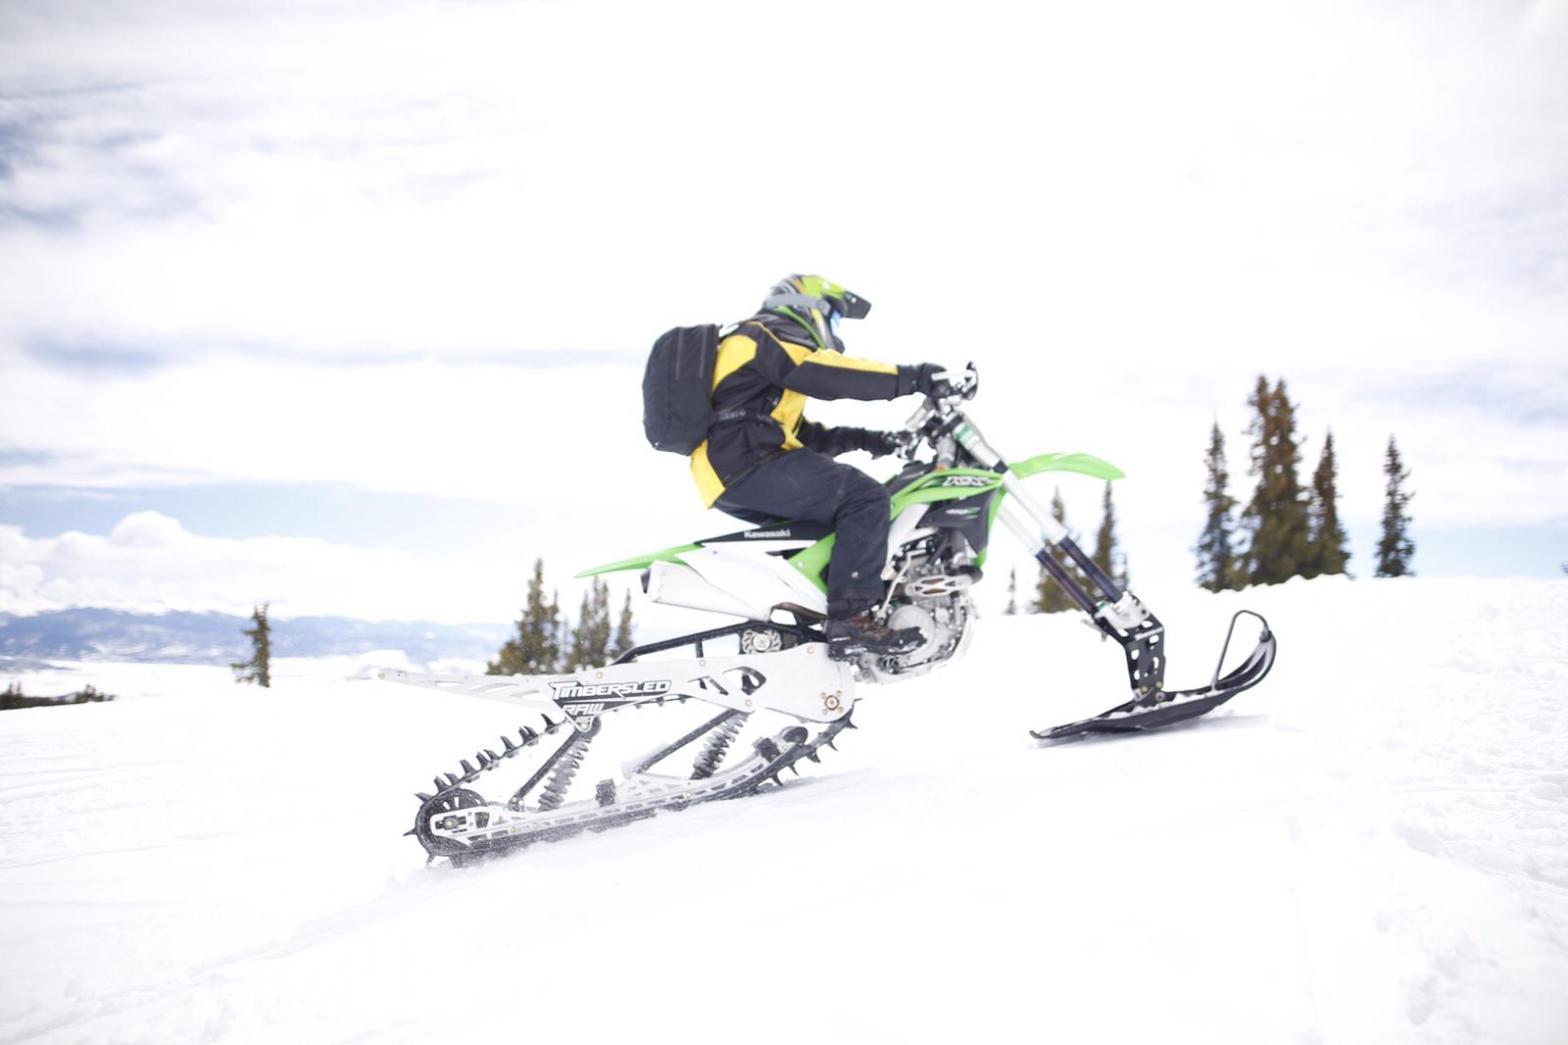 Timbersled RAW 120 Snow Bike-Kit